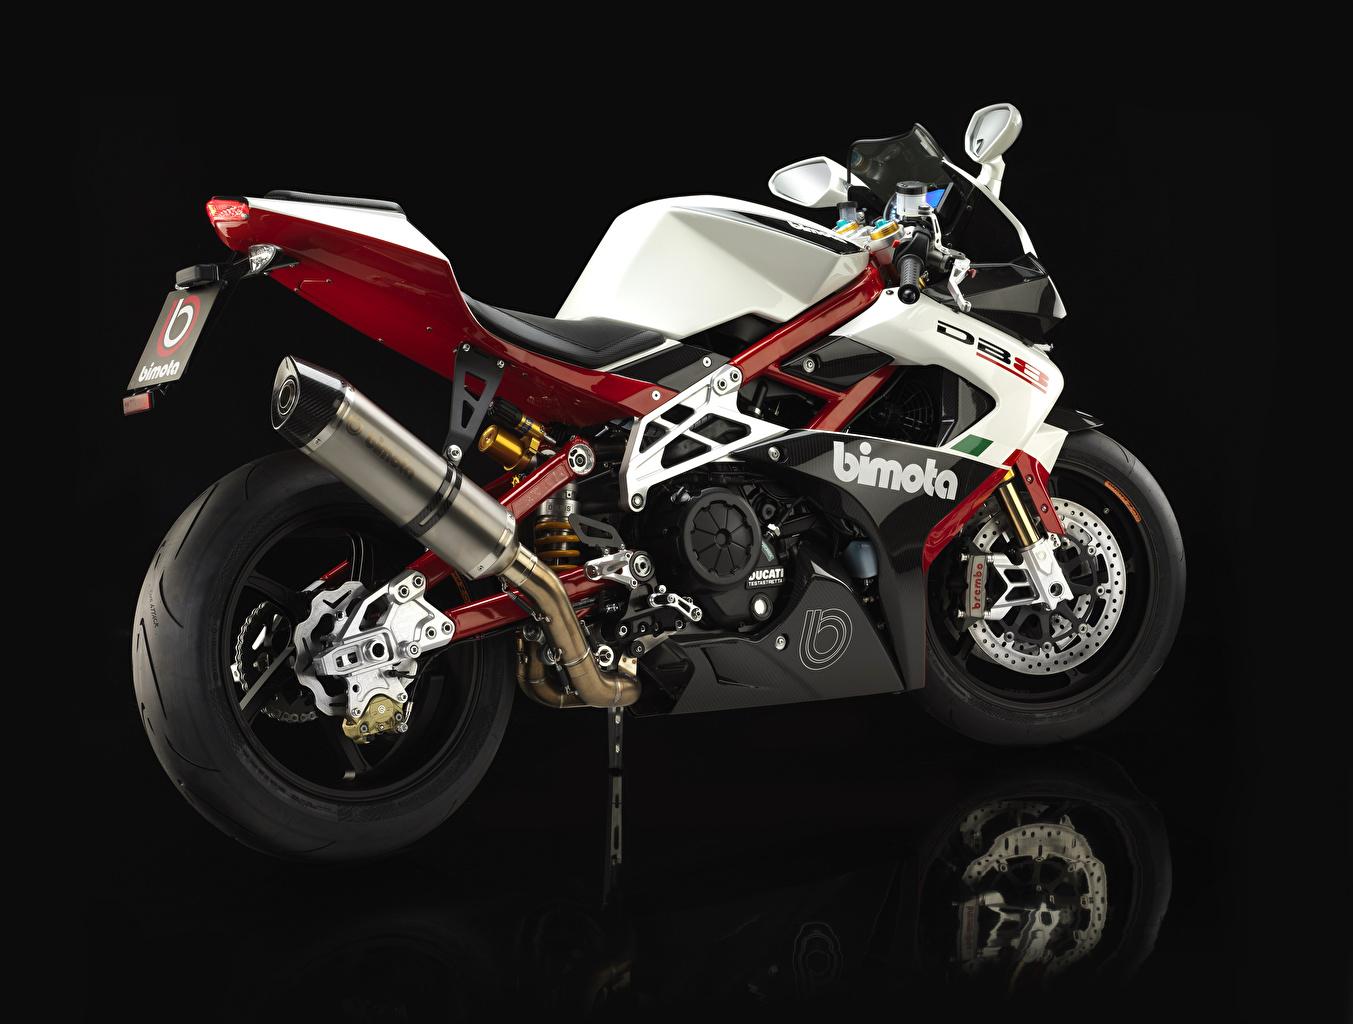 Photos 2013-16 Bimota DB8 Italia motorcycle Closeup Black background Motorcycles